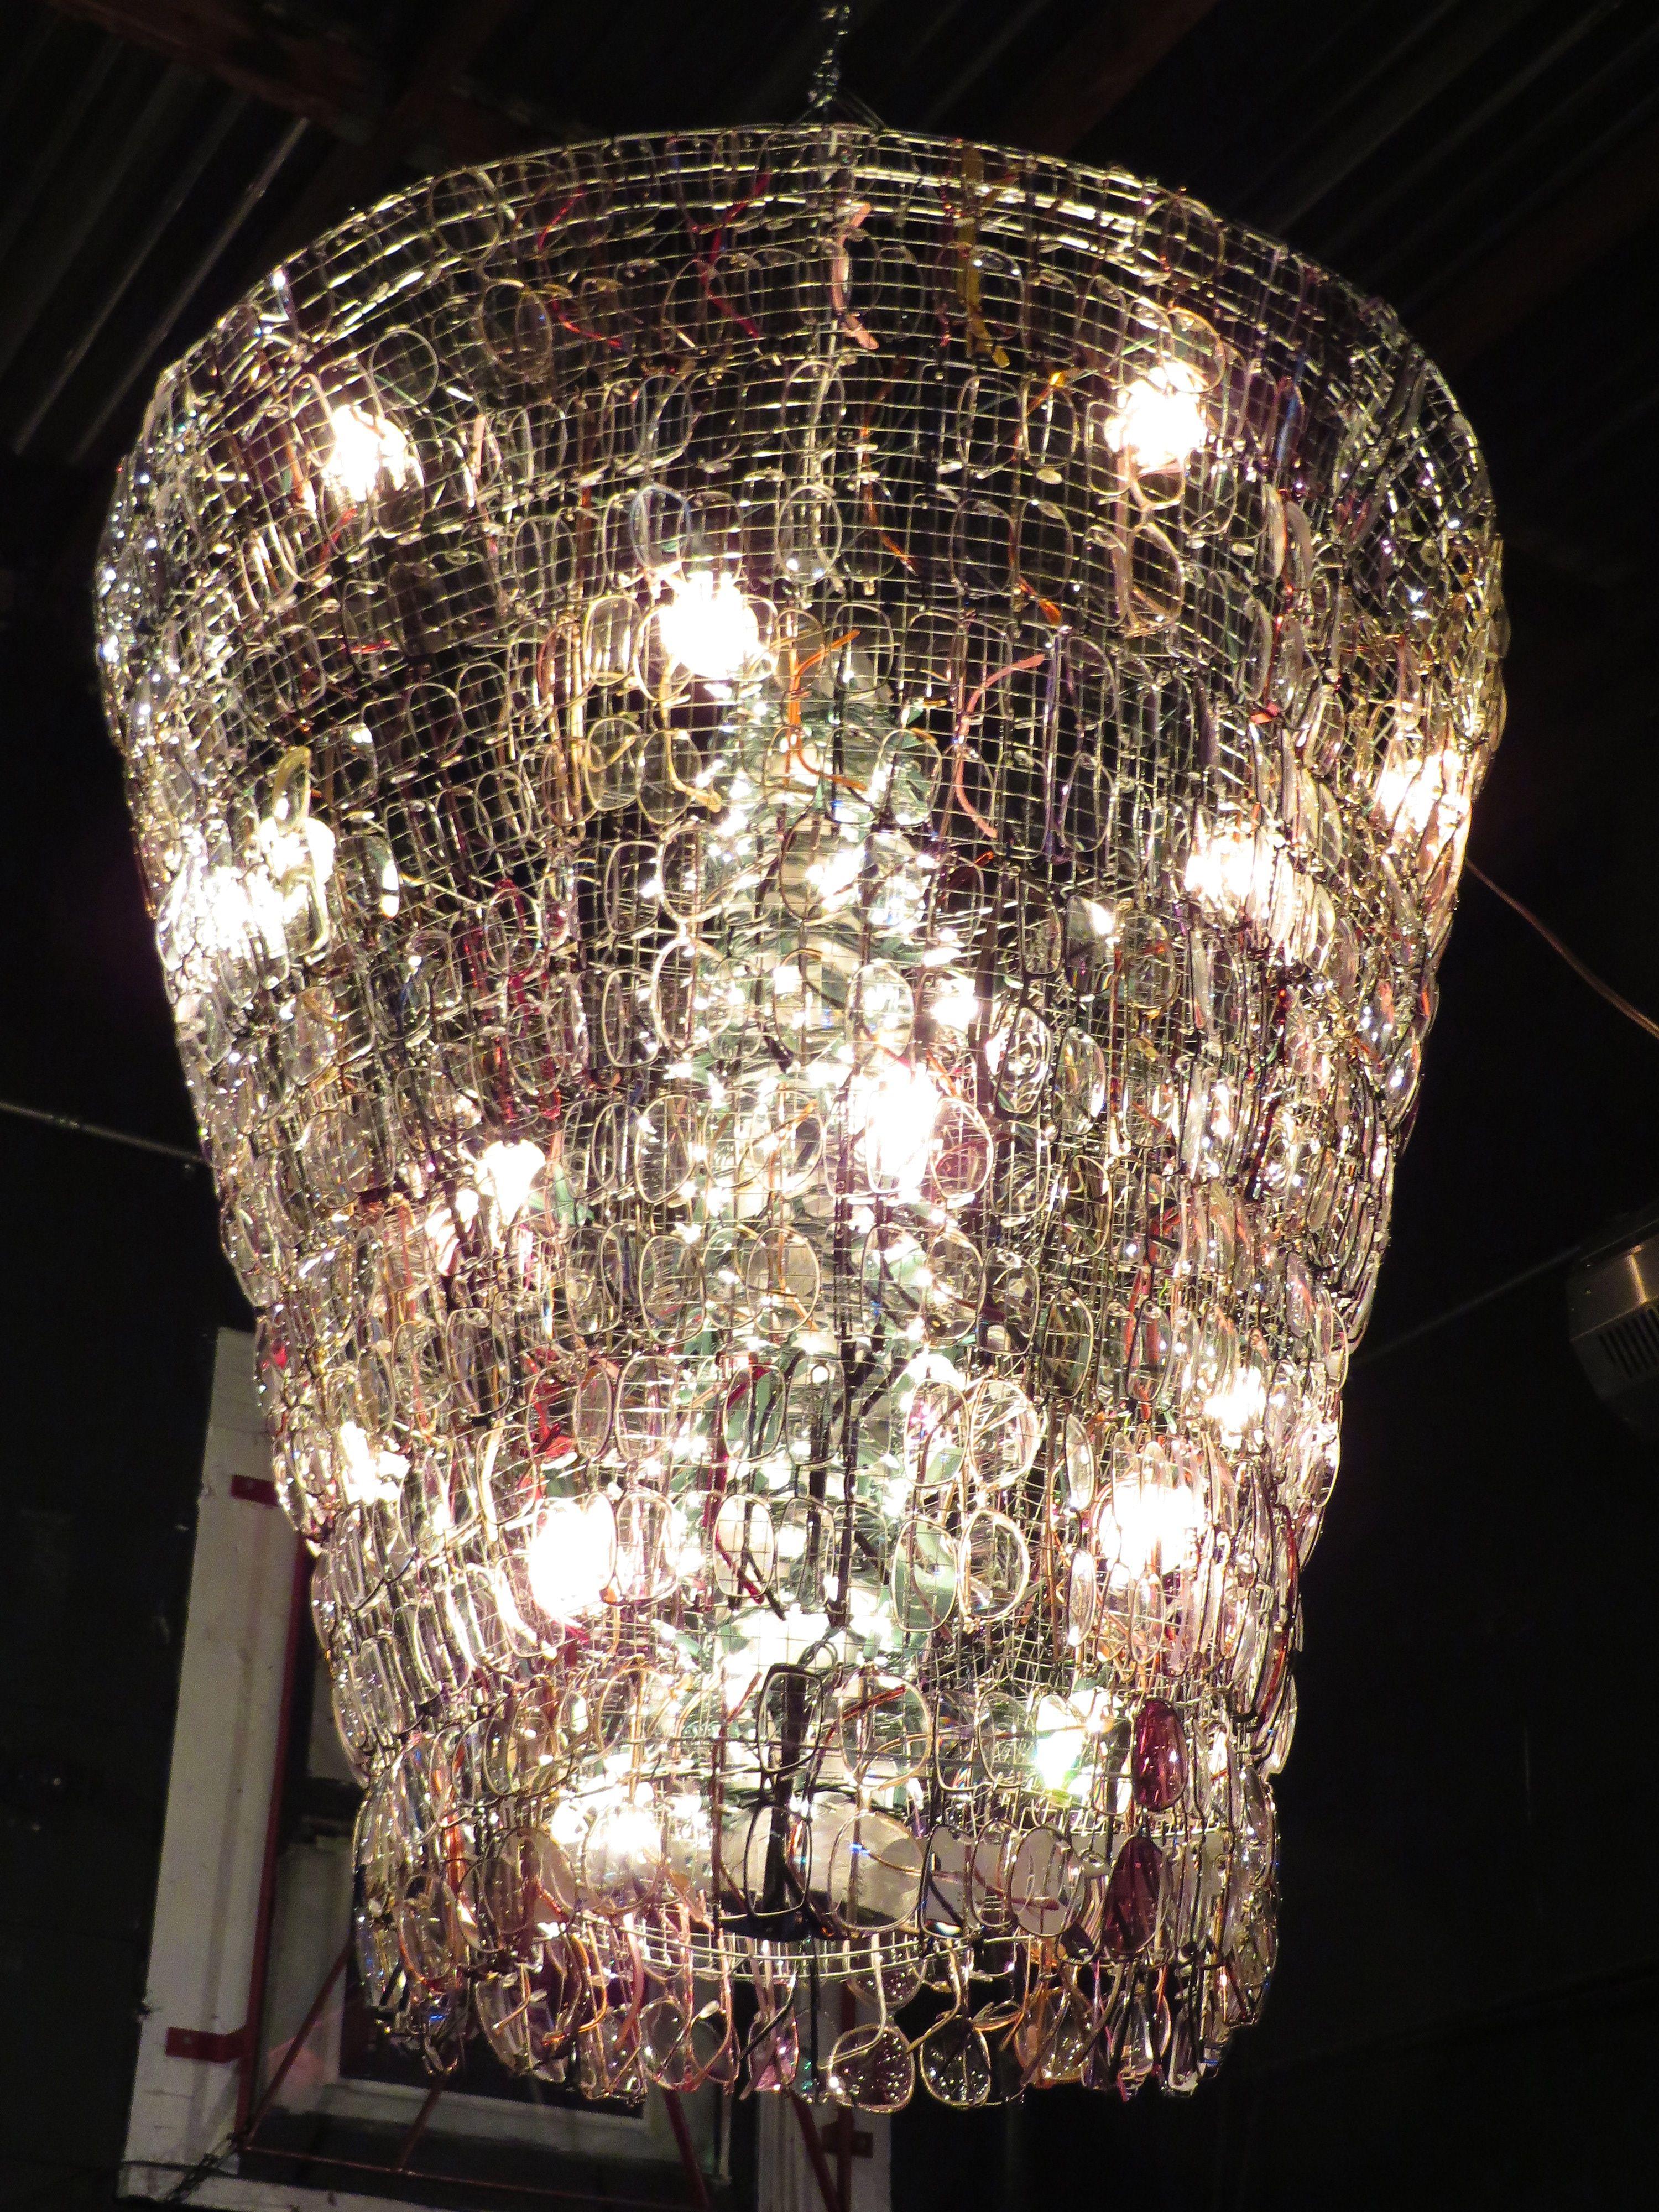 Urban chic eyeglass chandelier the party queen decor pinterest chandeliers arubaitofo Gallery